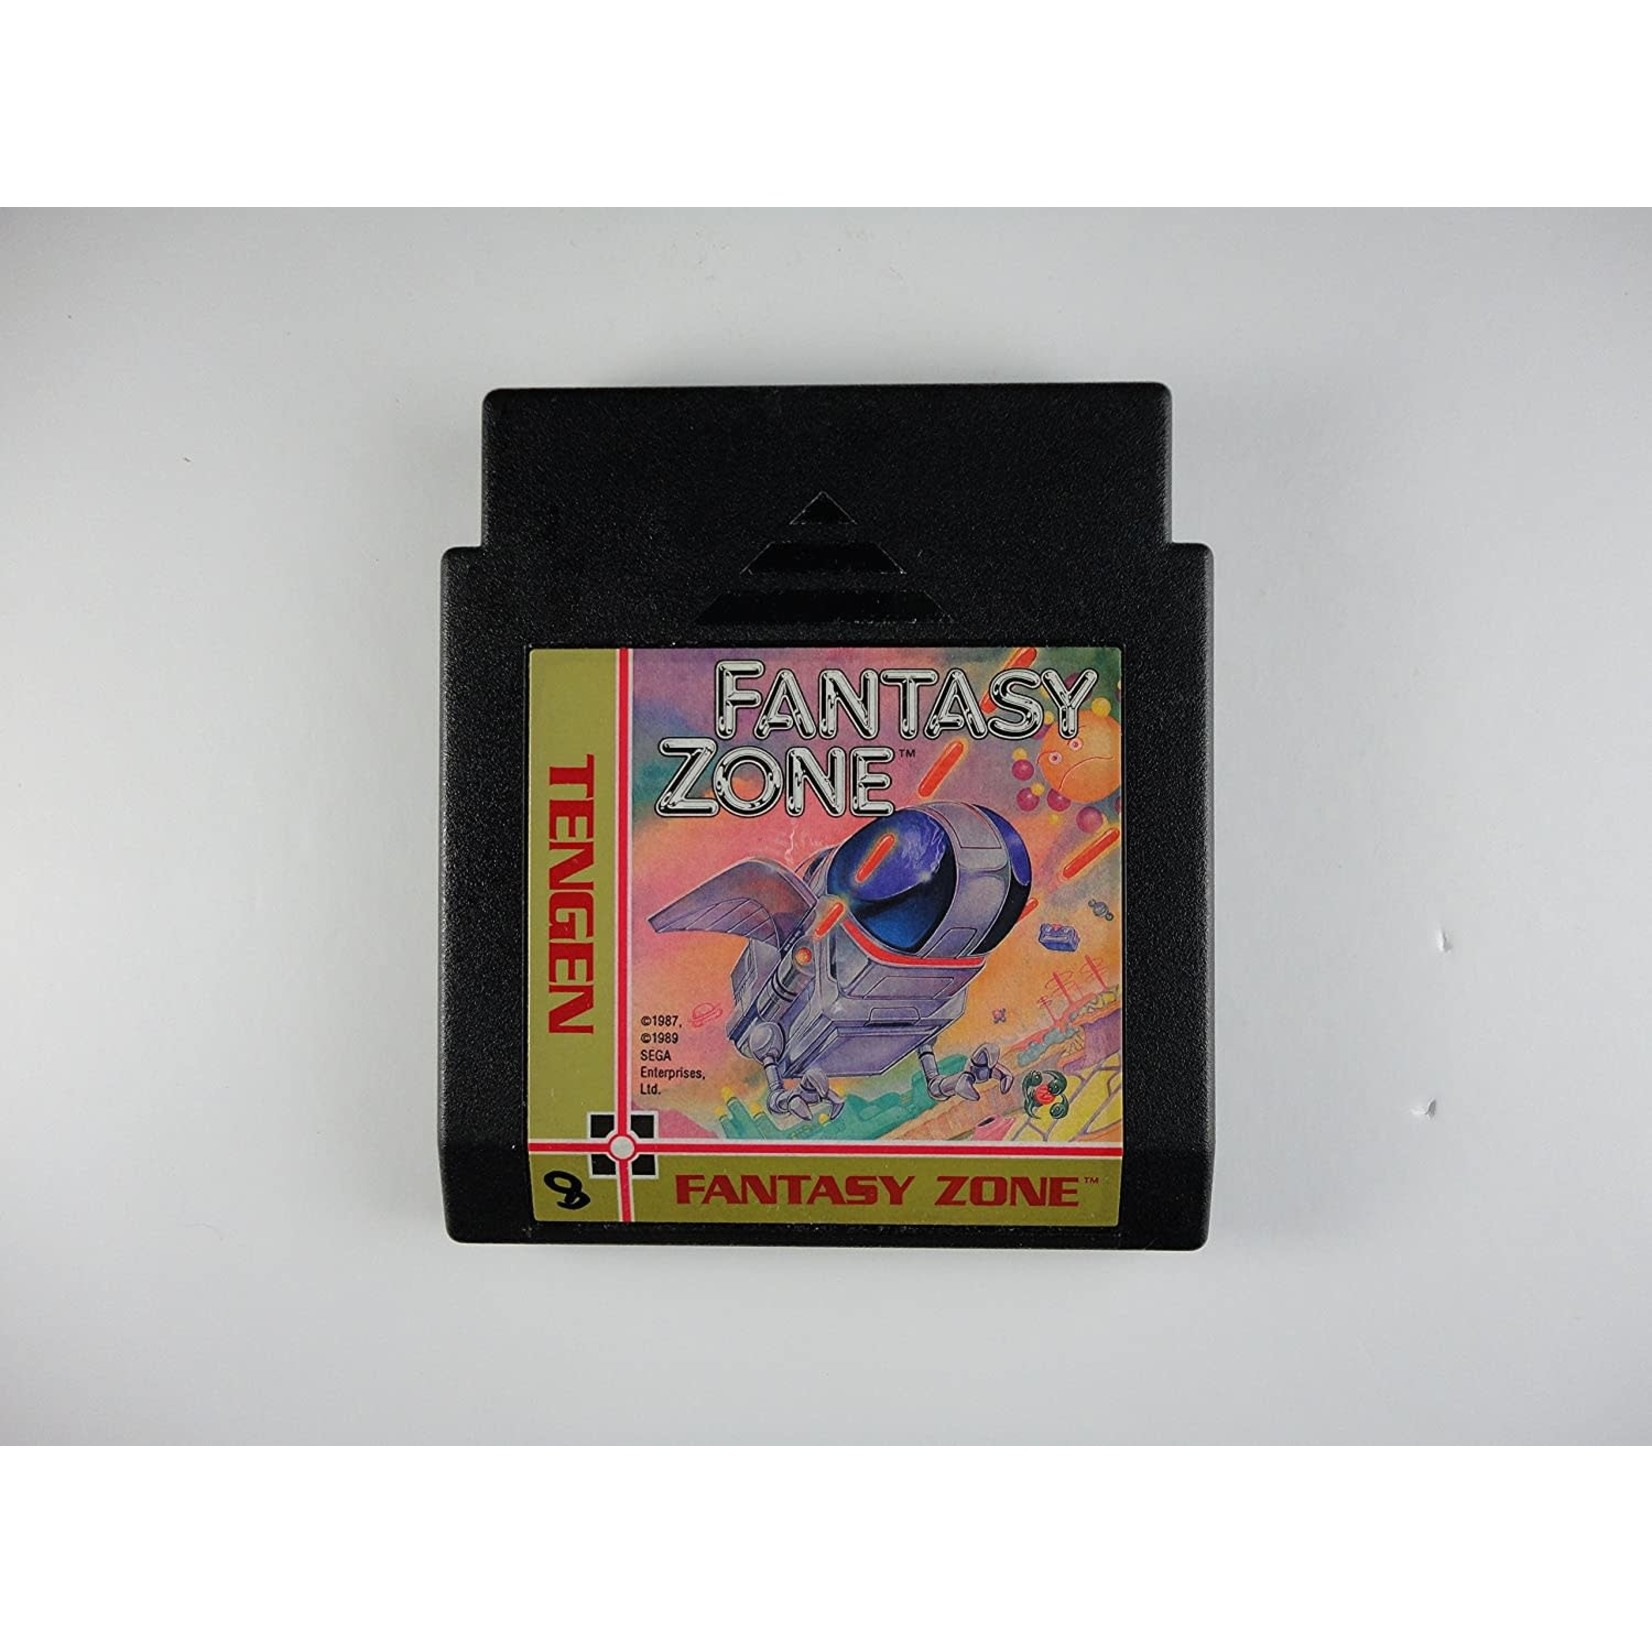 NESU-Fantasy Zone TENGEN (CART ONLY)